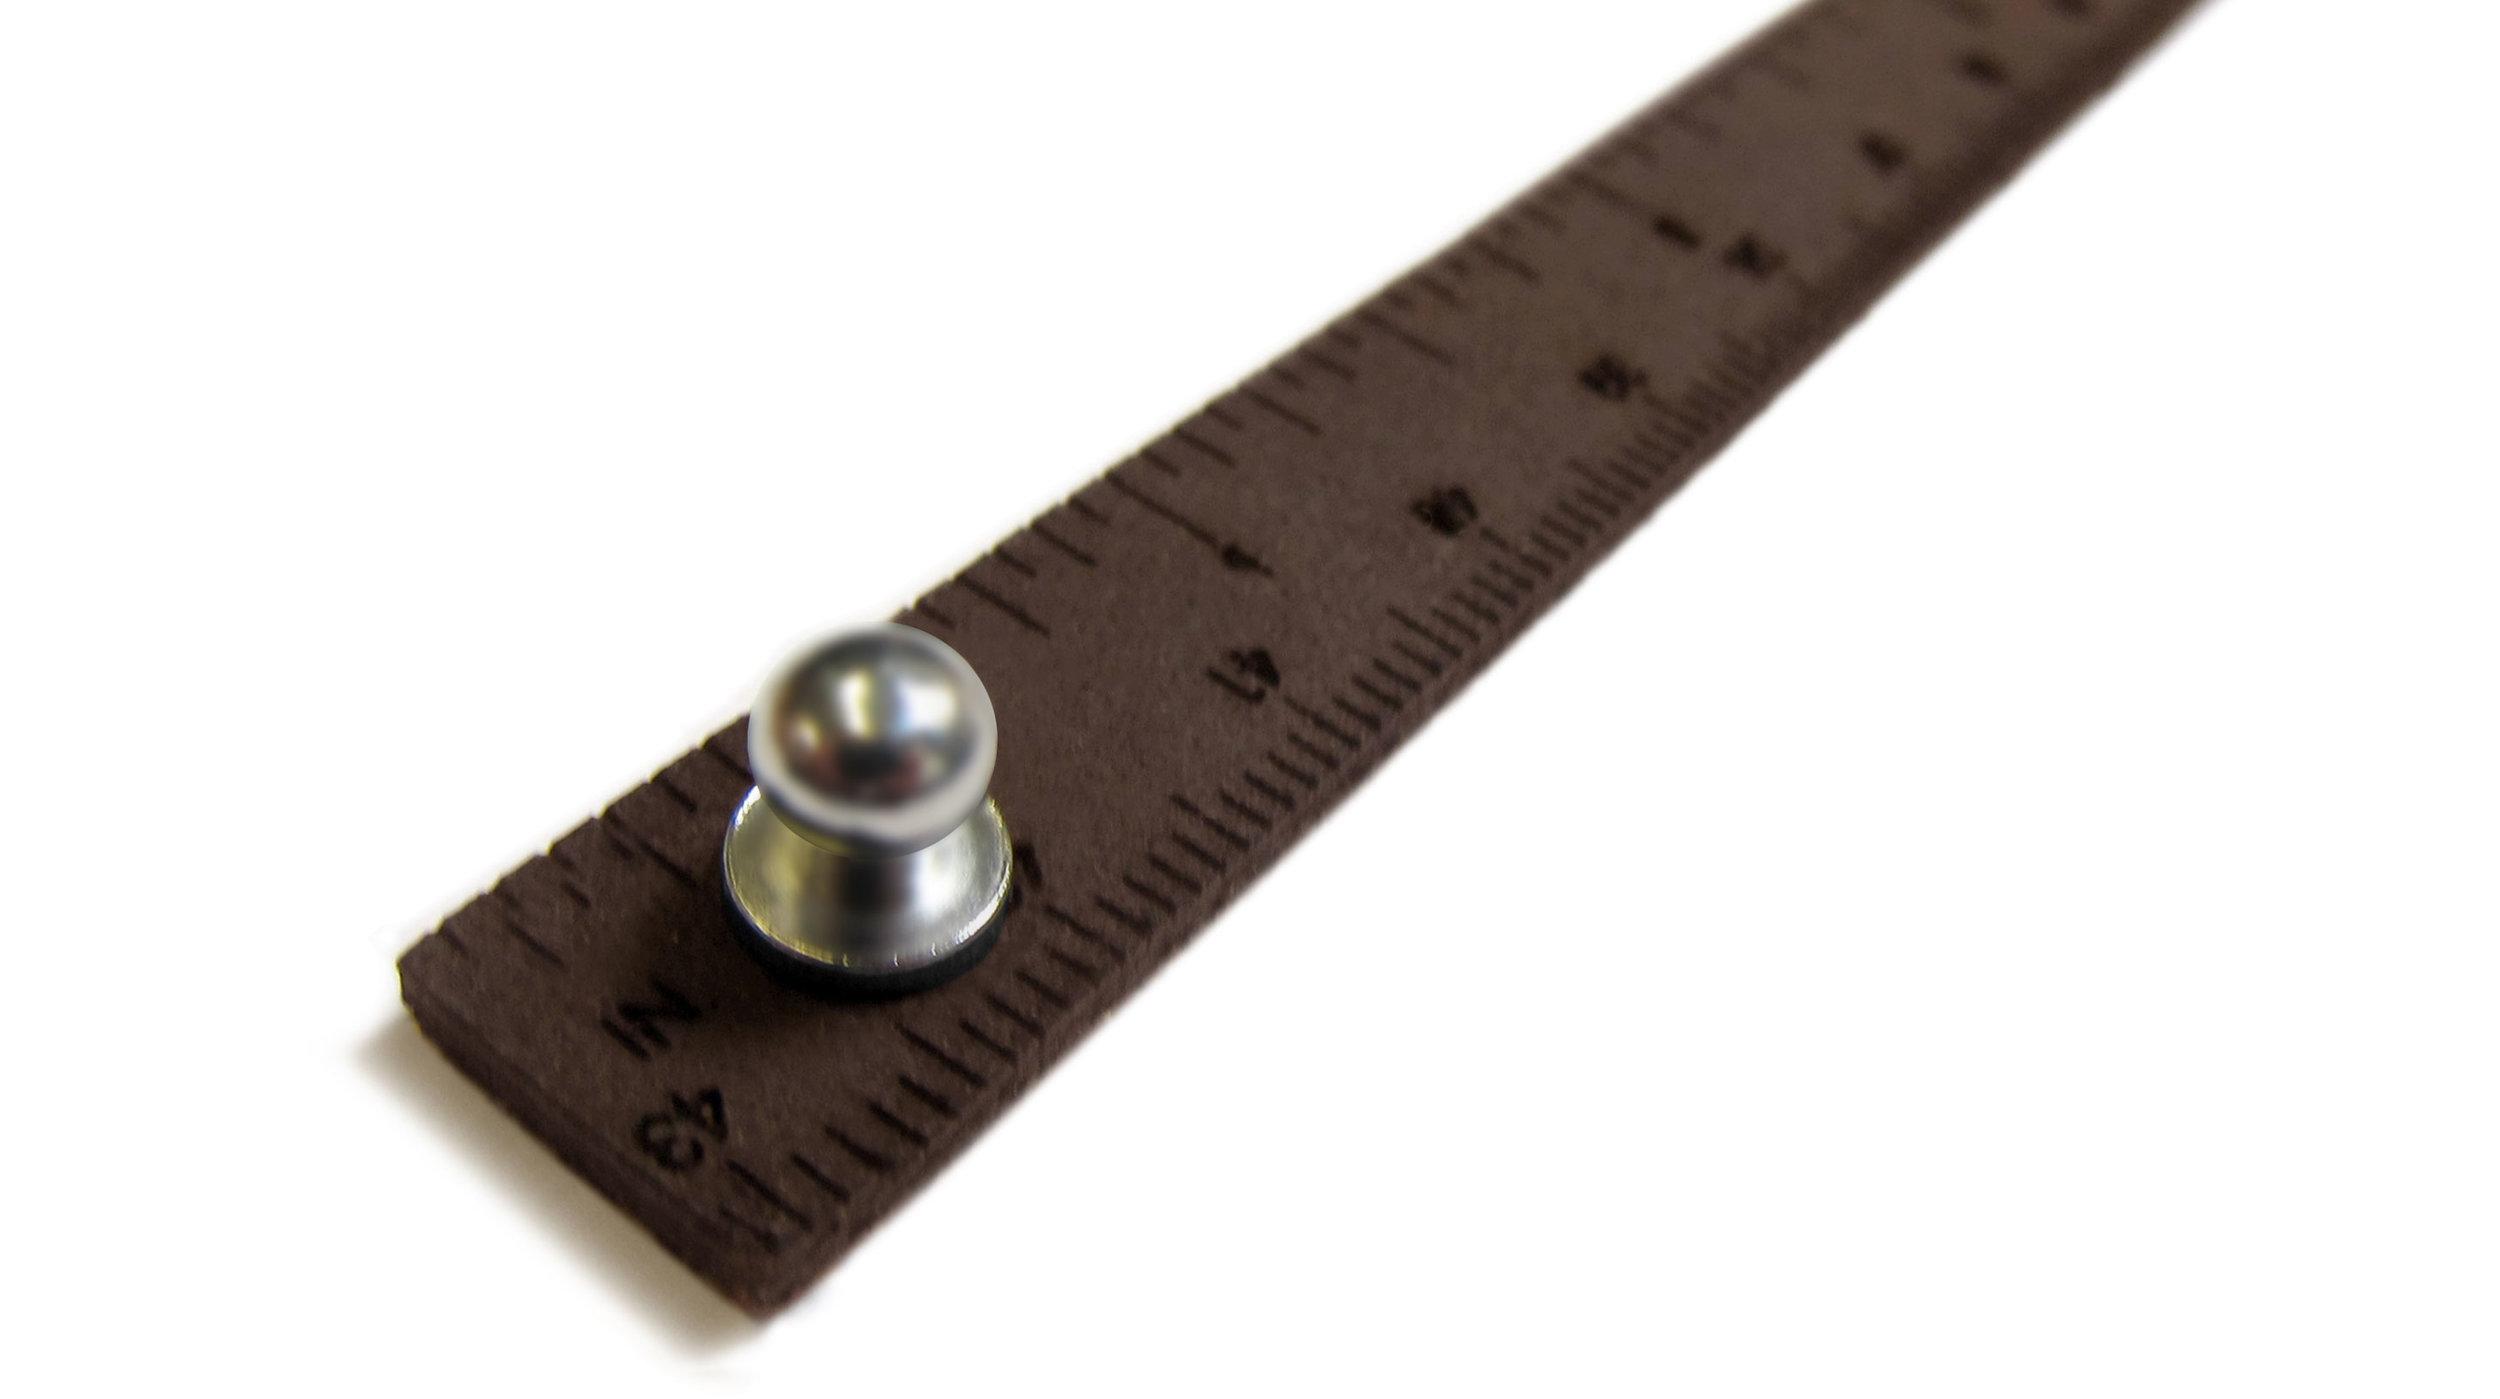 wrist-ruler-close-up.jpg